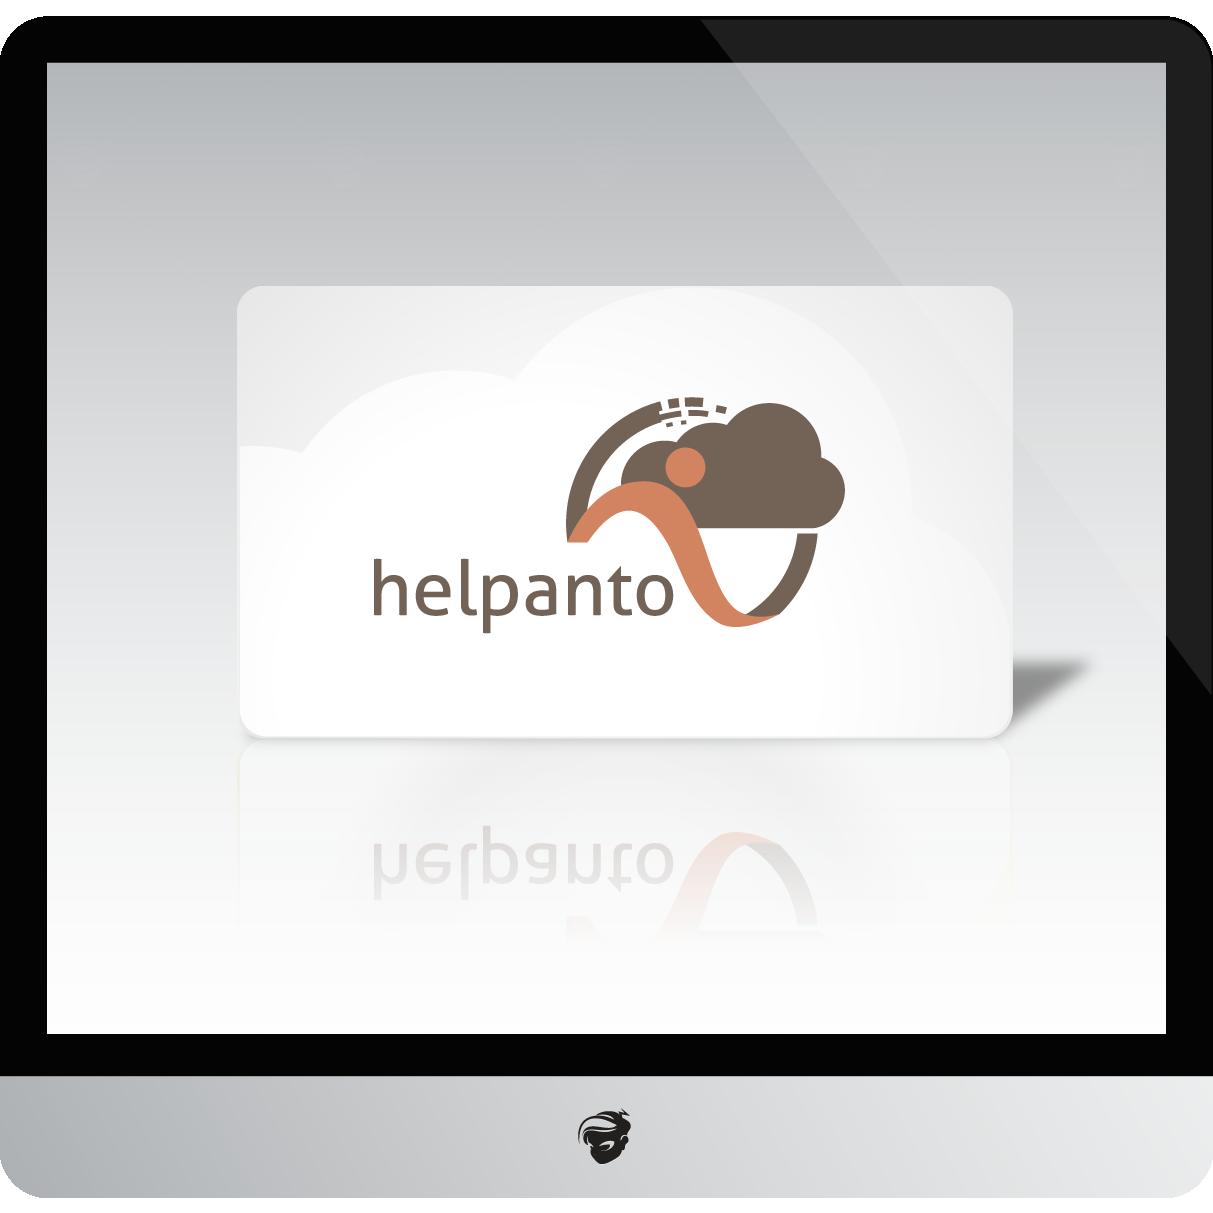 Logo Design by zesthar - Entry No. 141 in the Logo Design Contest Artistic Logo Design for helpanto.